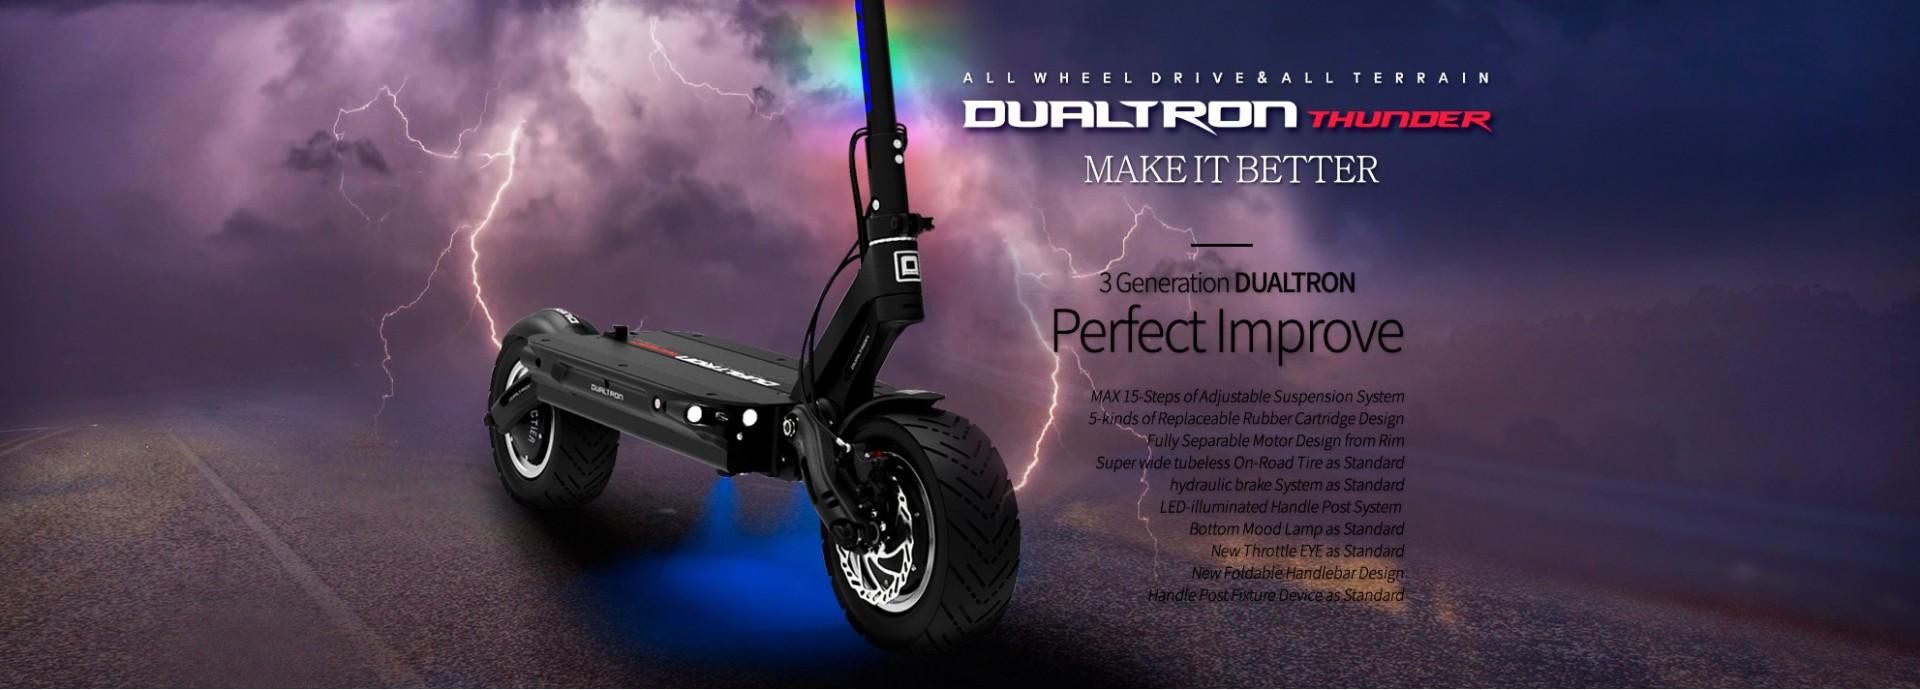 Dualtron